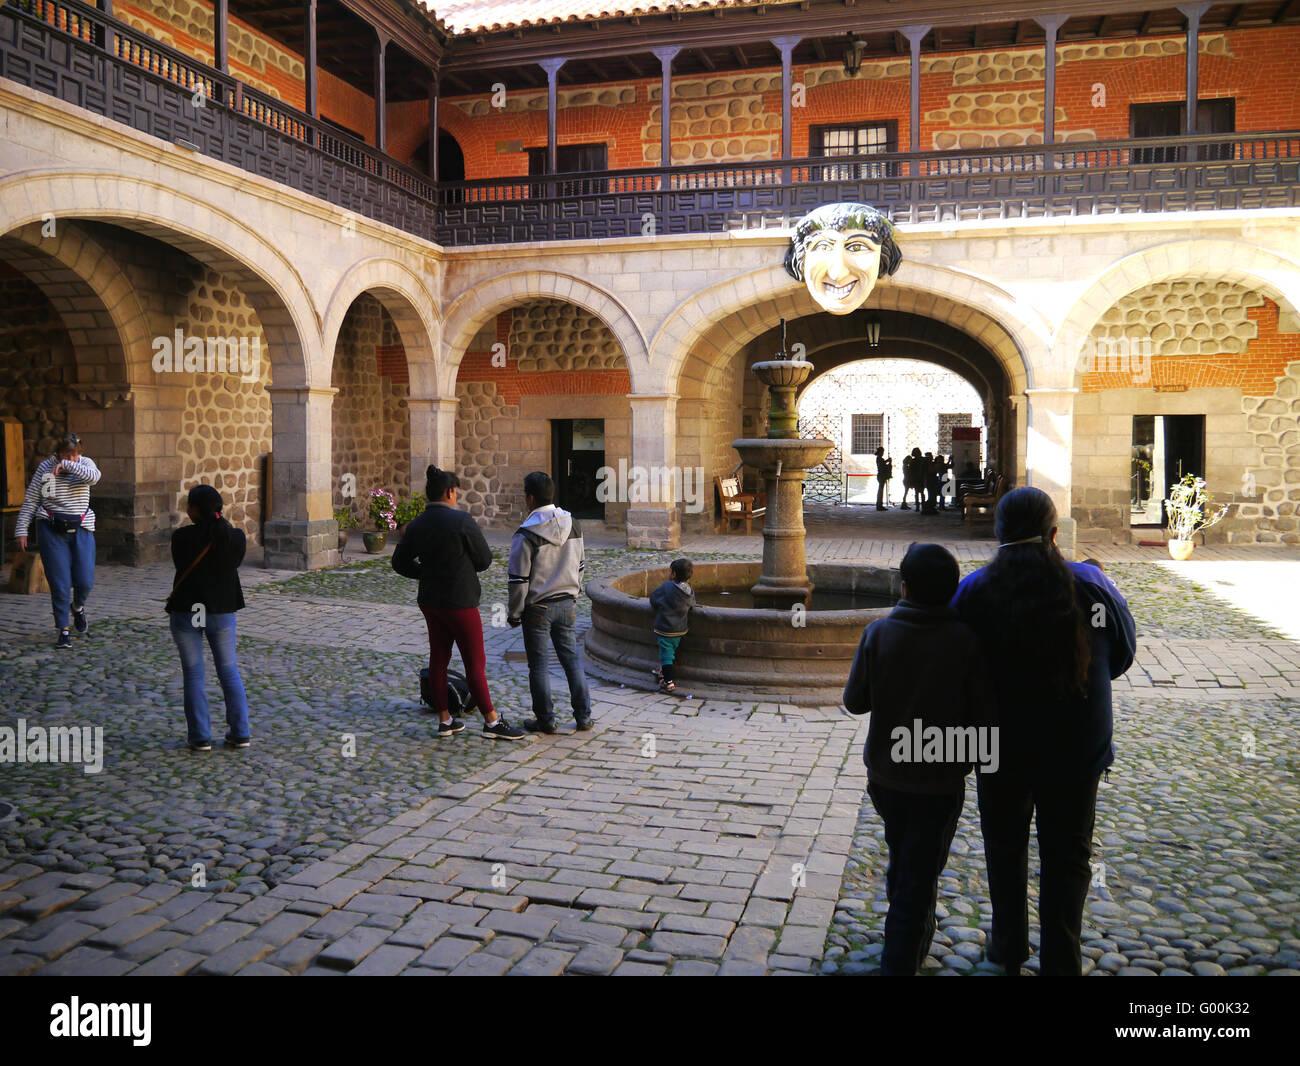 Courtyard of Potosi Mint - Stock Image